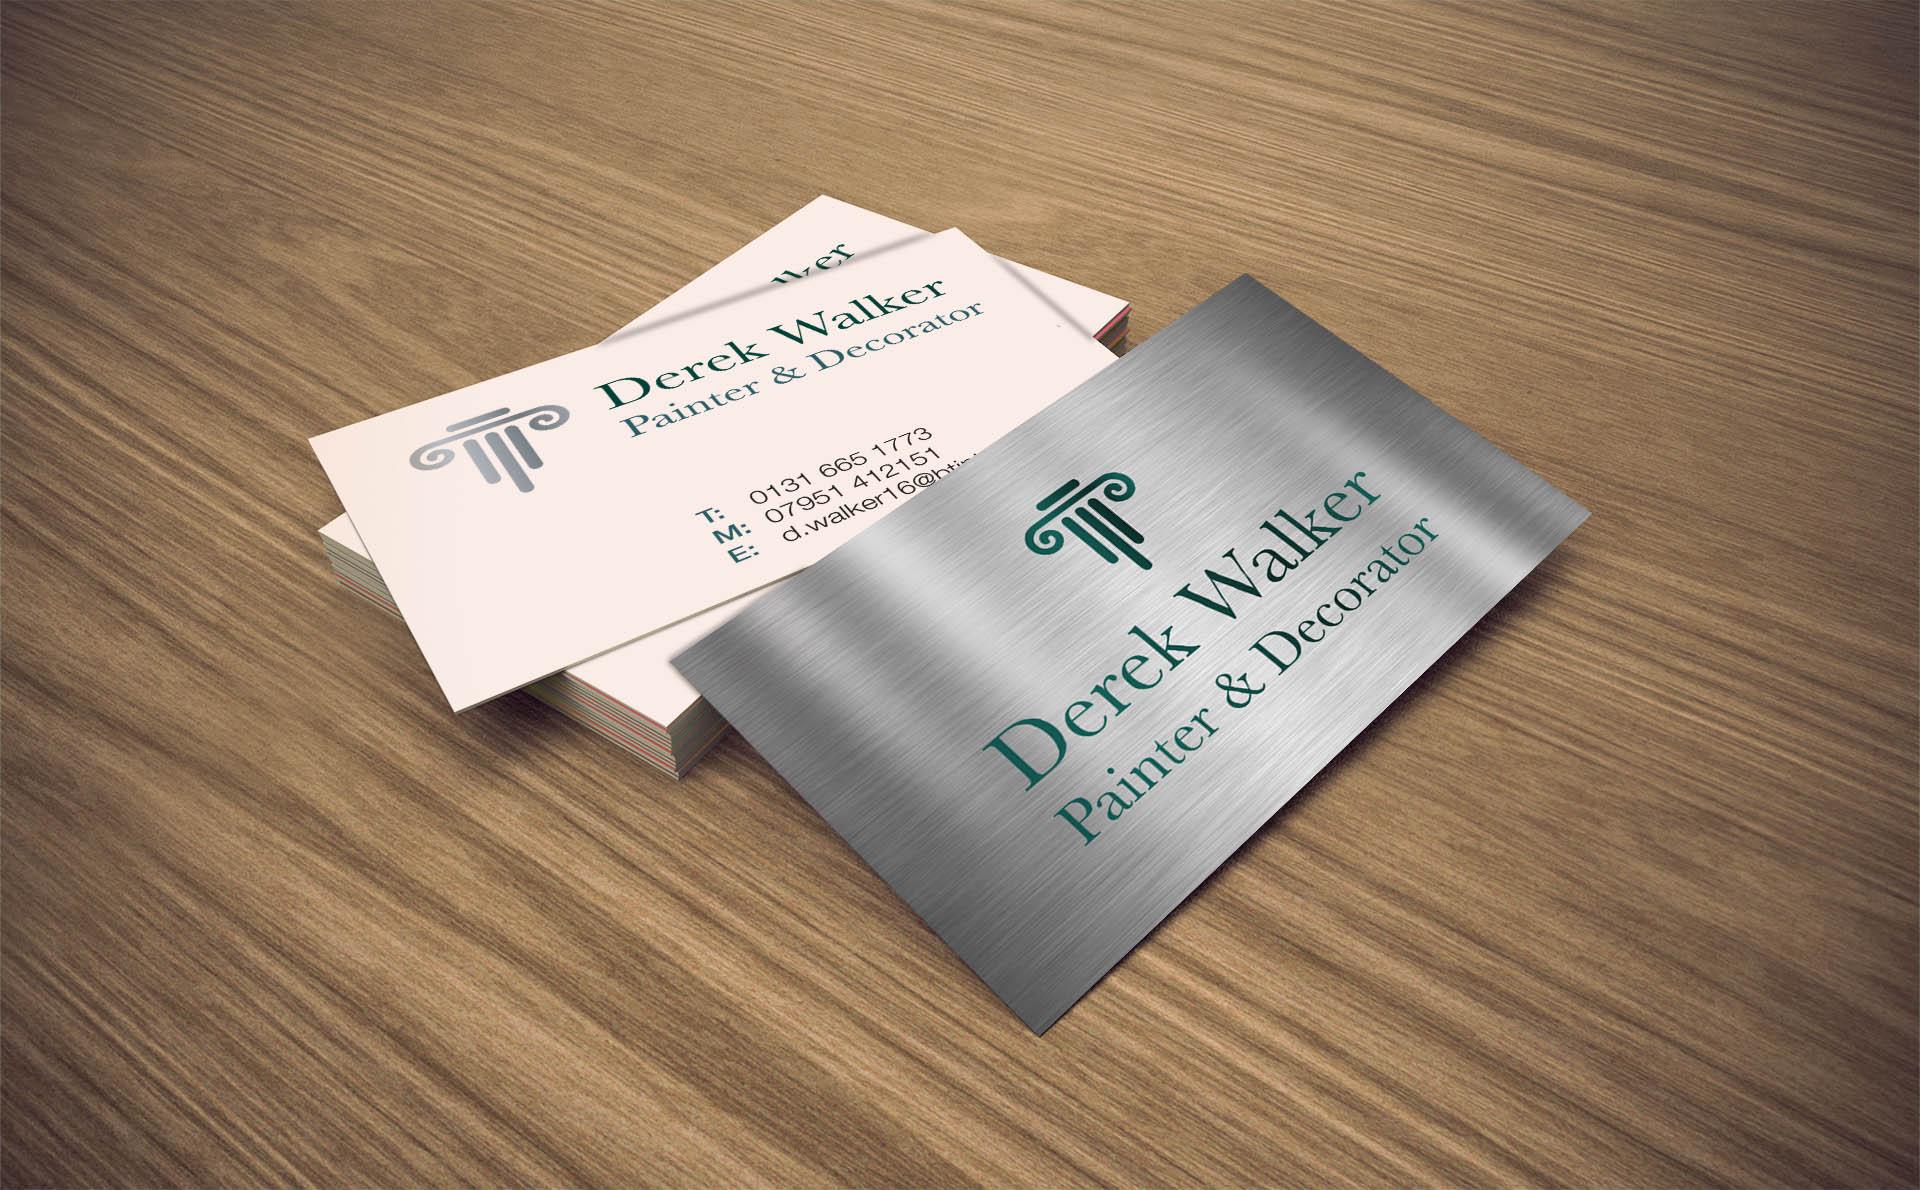 Derek Walker Painter & Decorator Design print buiness cards Edinburegh Fearless Creative